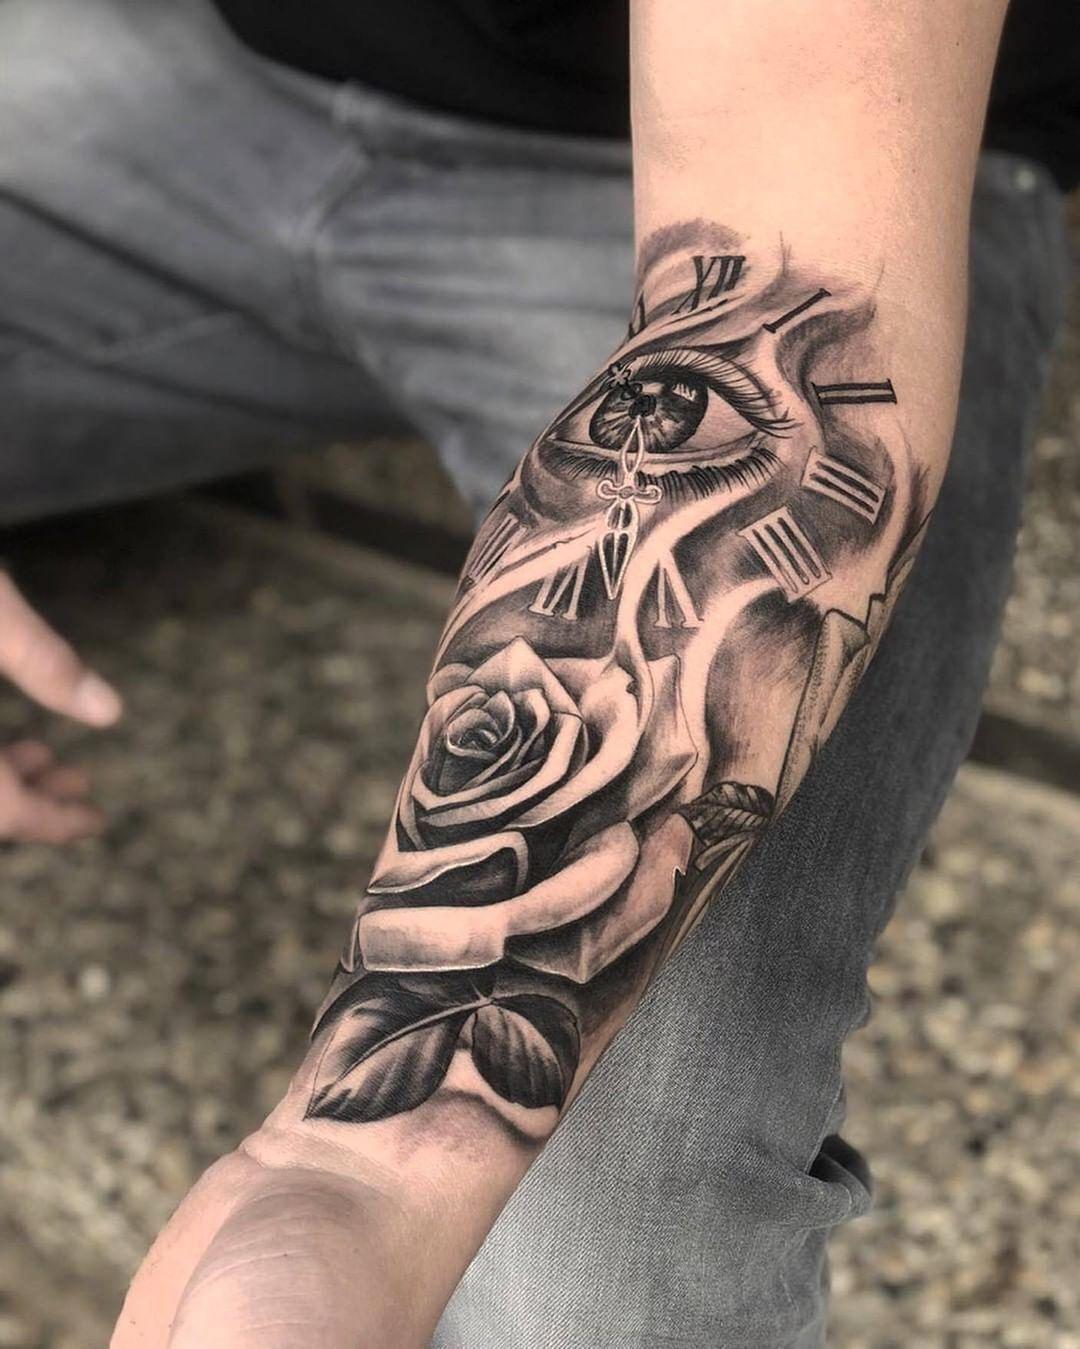 Mann hand tattoo 30 Handgelenk